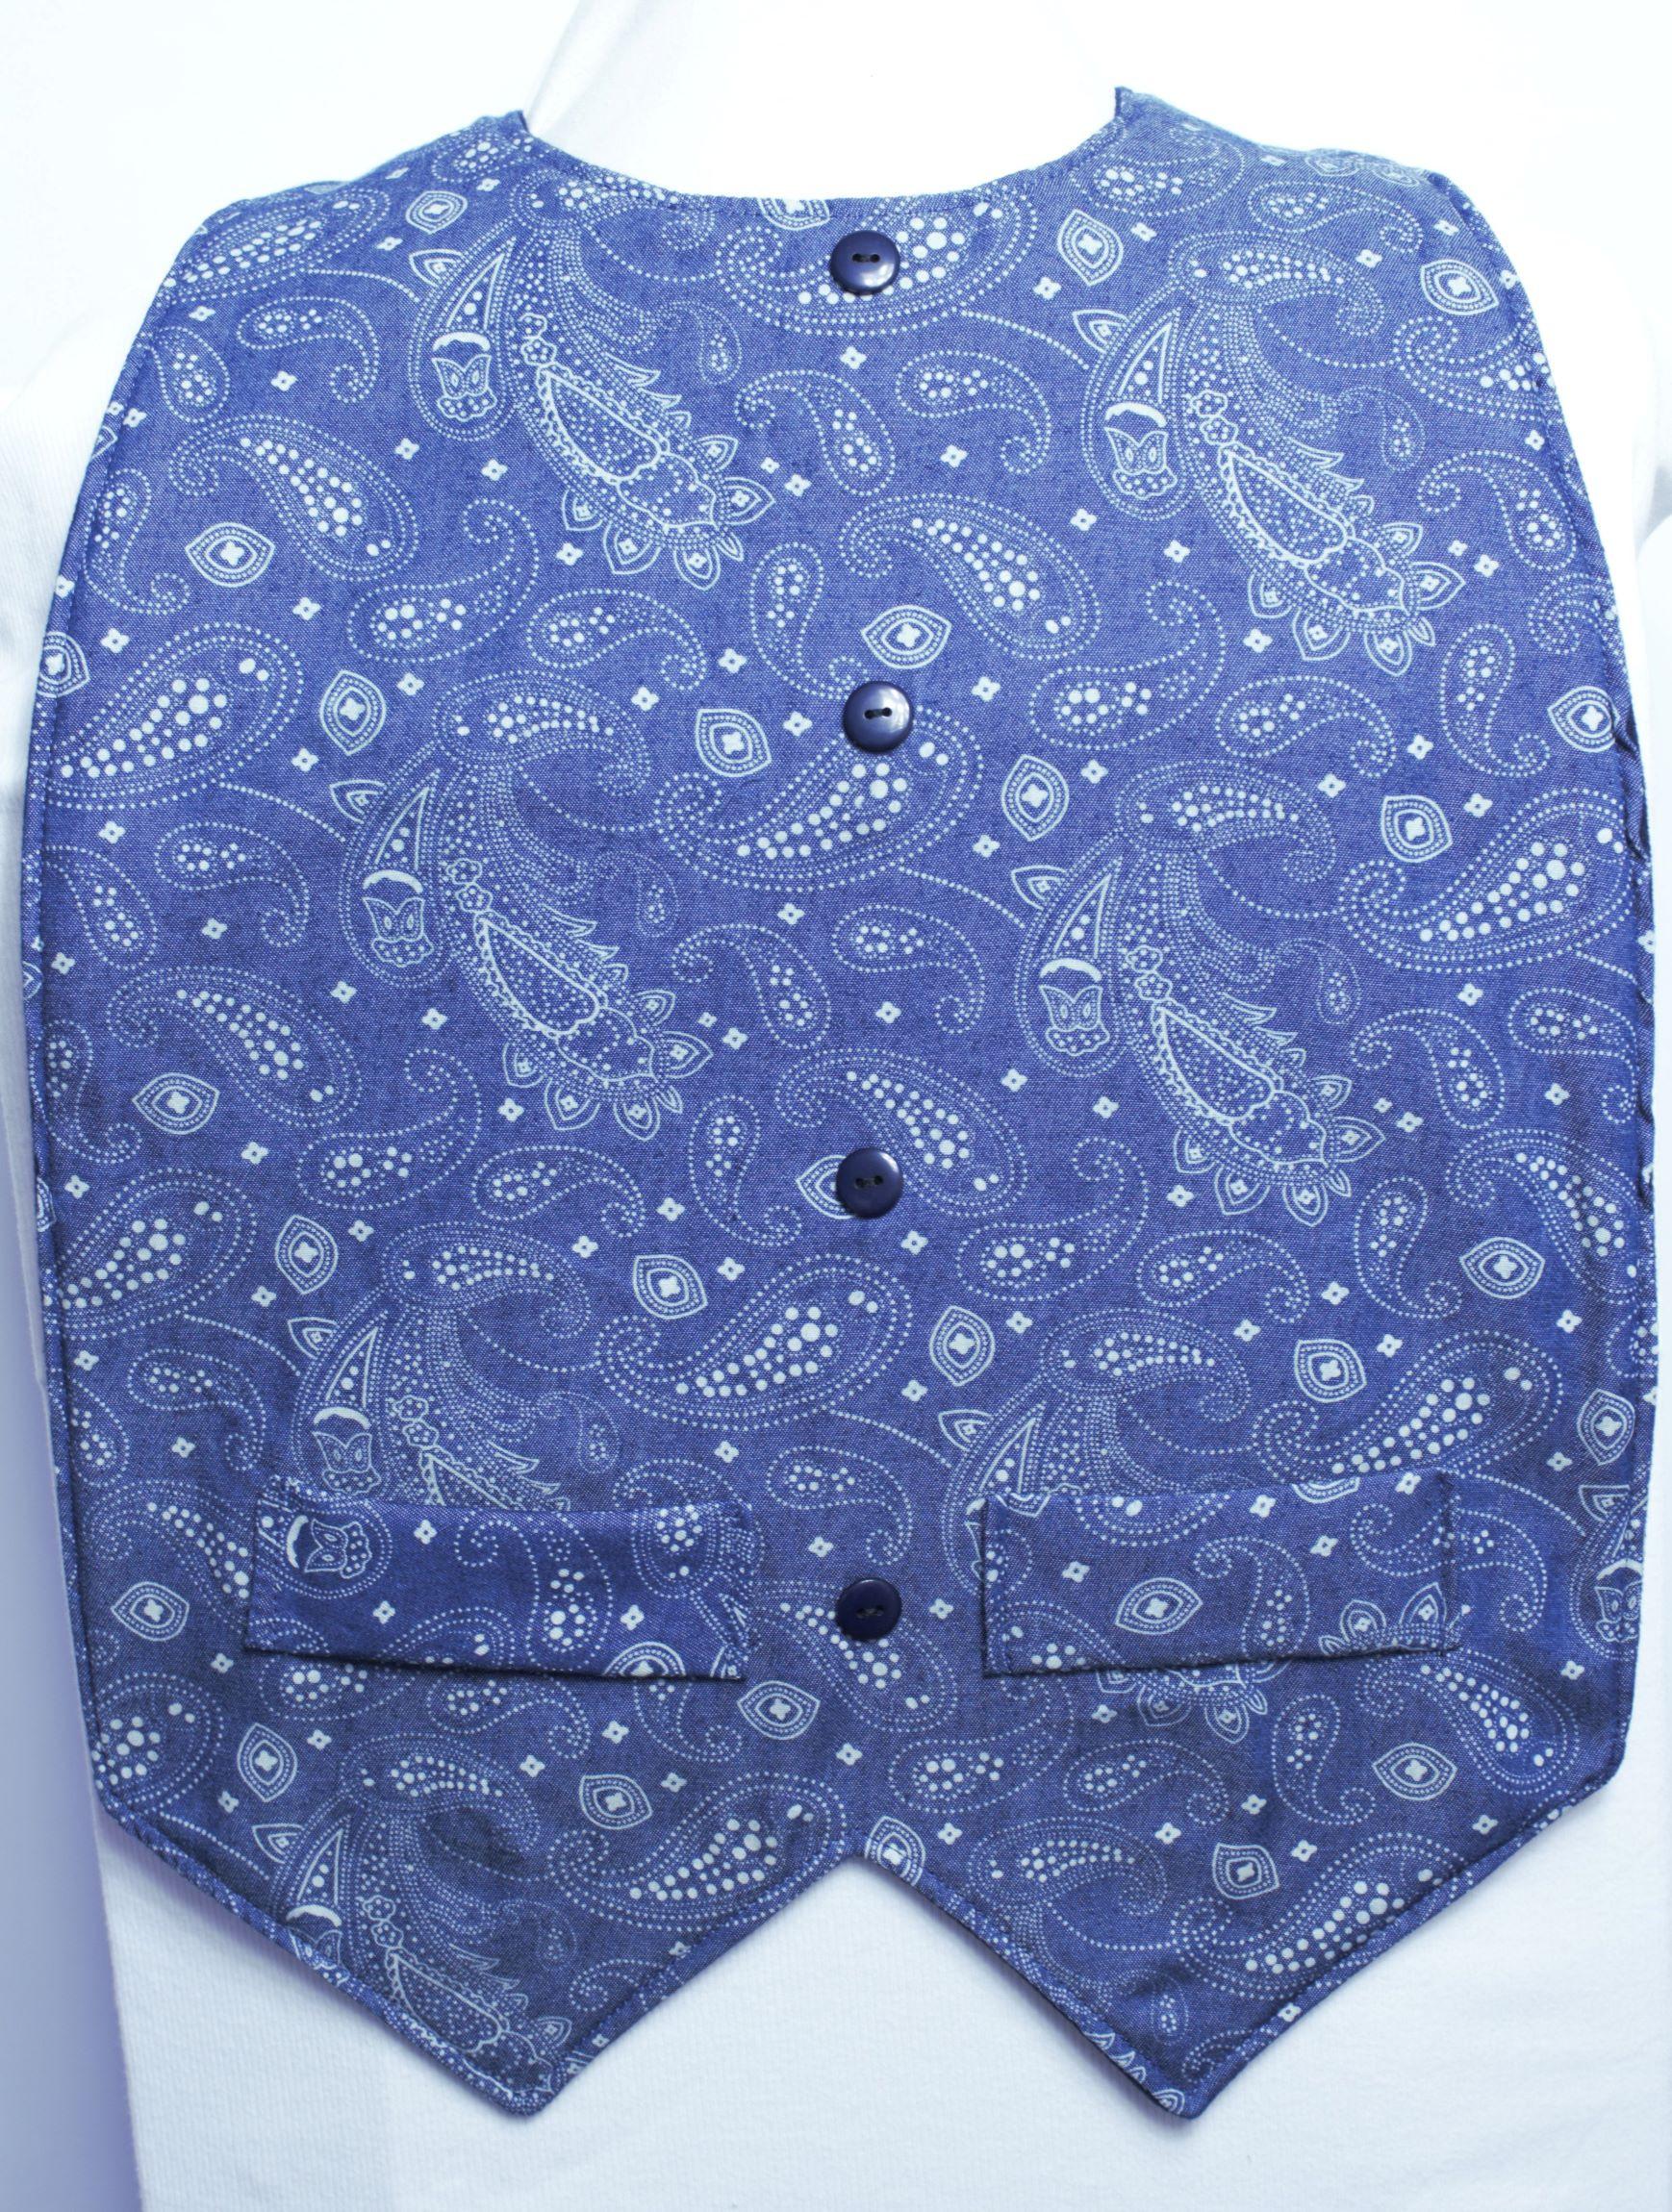 Denim Paisley Waistcoat Style - Extra Protect Long Length Clothing Protector